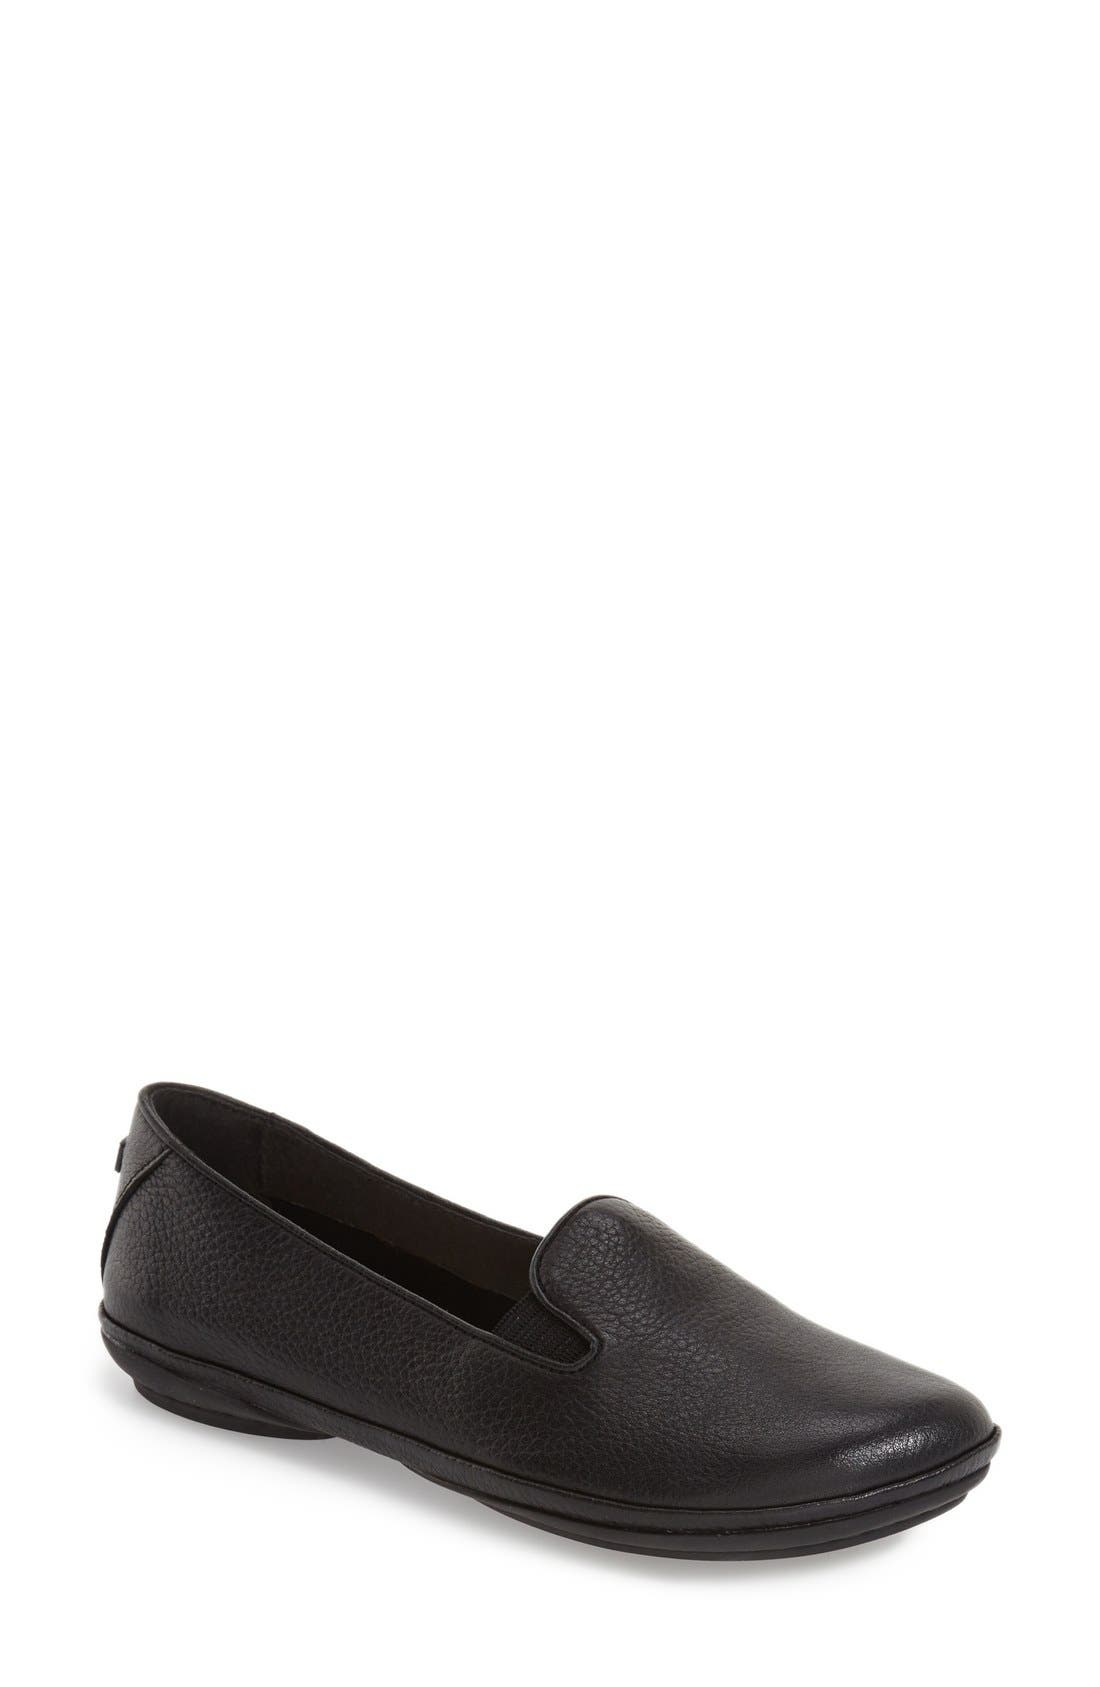 CAMPER 'Right Nina' Leather Flat, Main, color, BLACK/ BLACK LEATHER